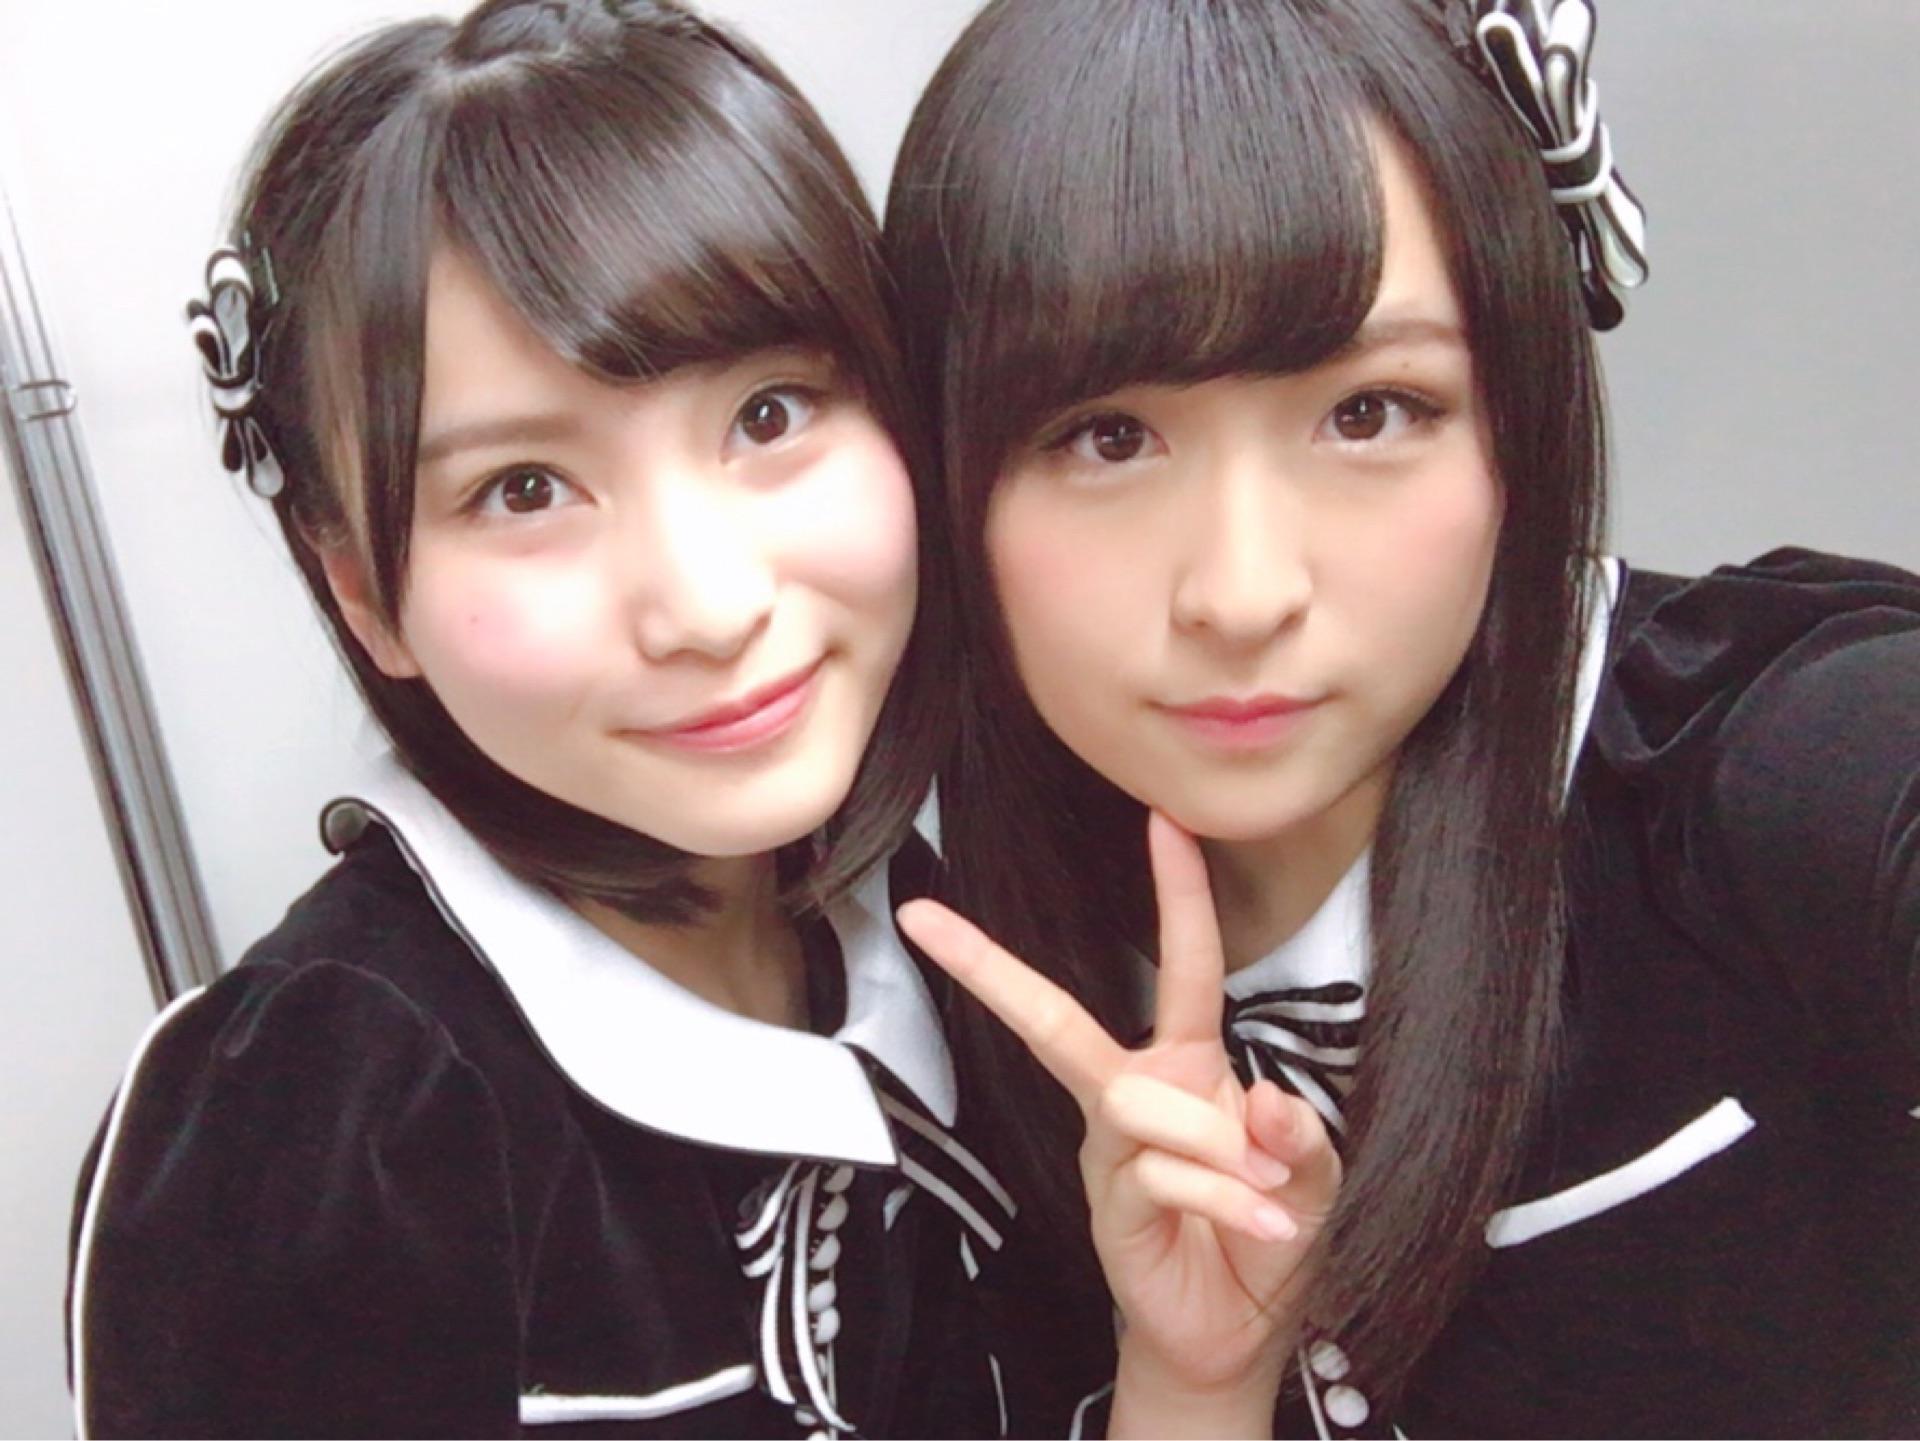 【AKB48】福岡聖菜応援スレ☆49【せいちゃん】©2ch.netYouTube動画>13本 ->画像>992枚